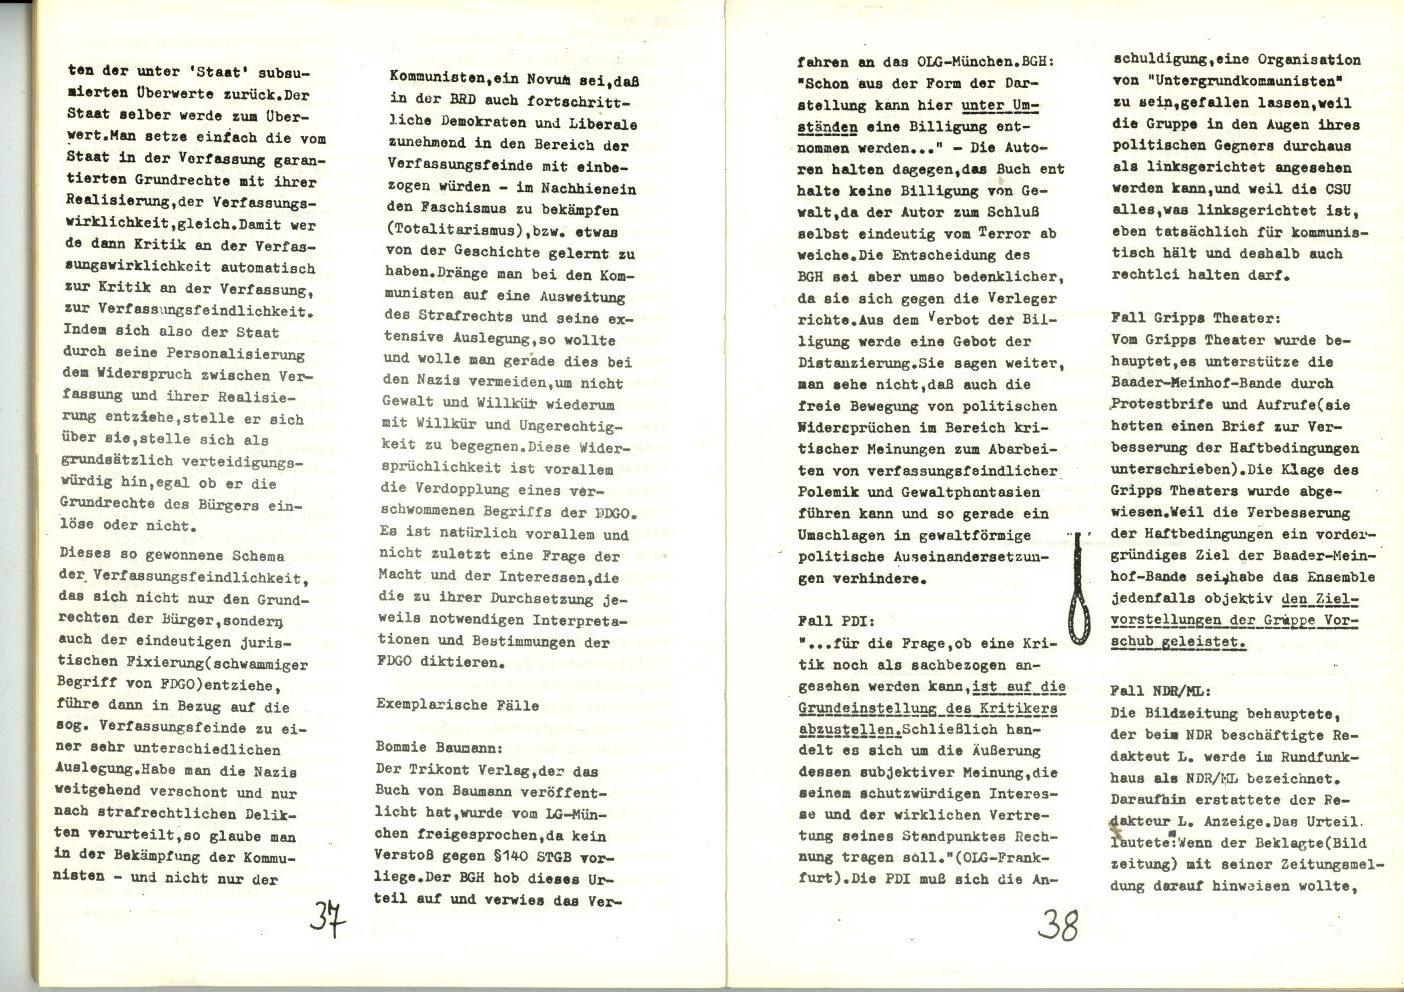 Marburg_Russell_Initiative_1978_20